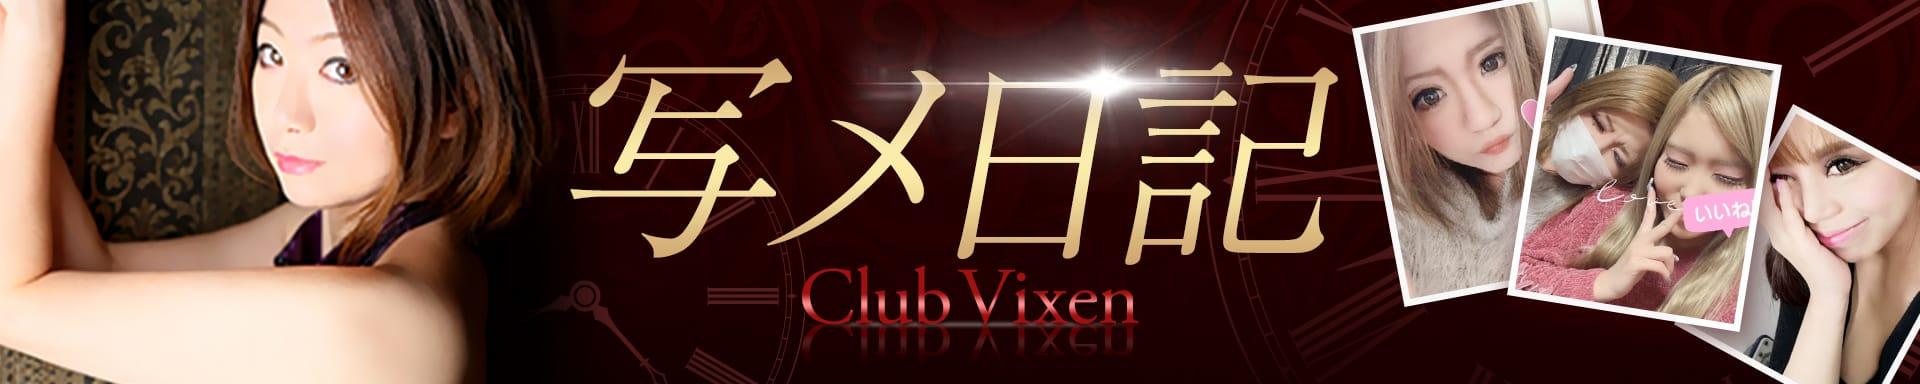 Club Vixen(クラブヴィクセン) その3